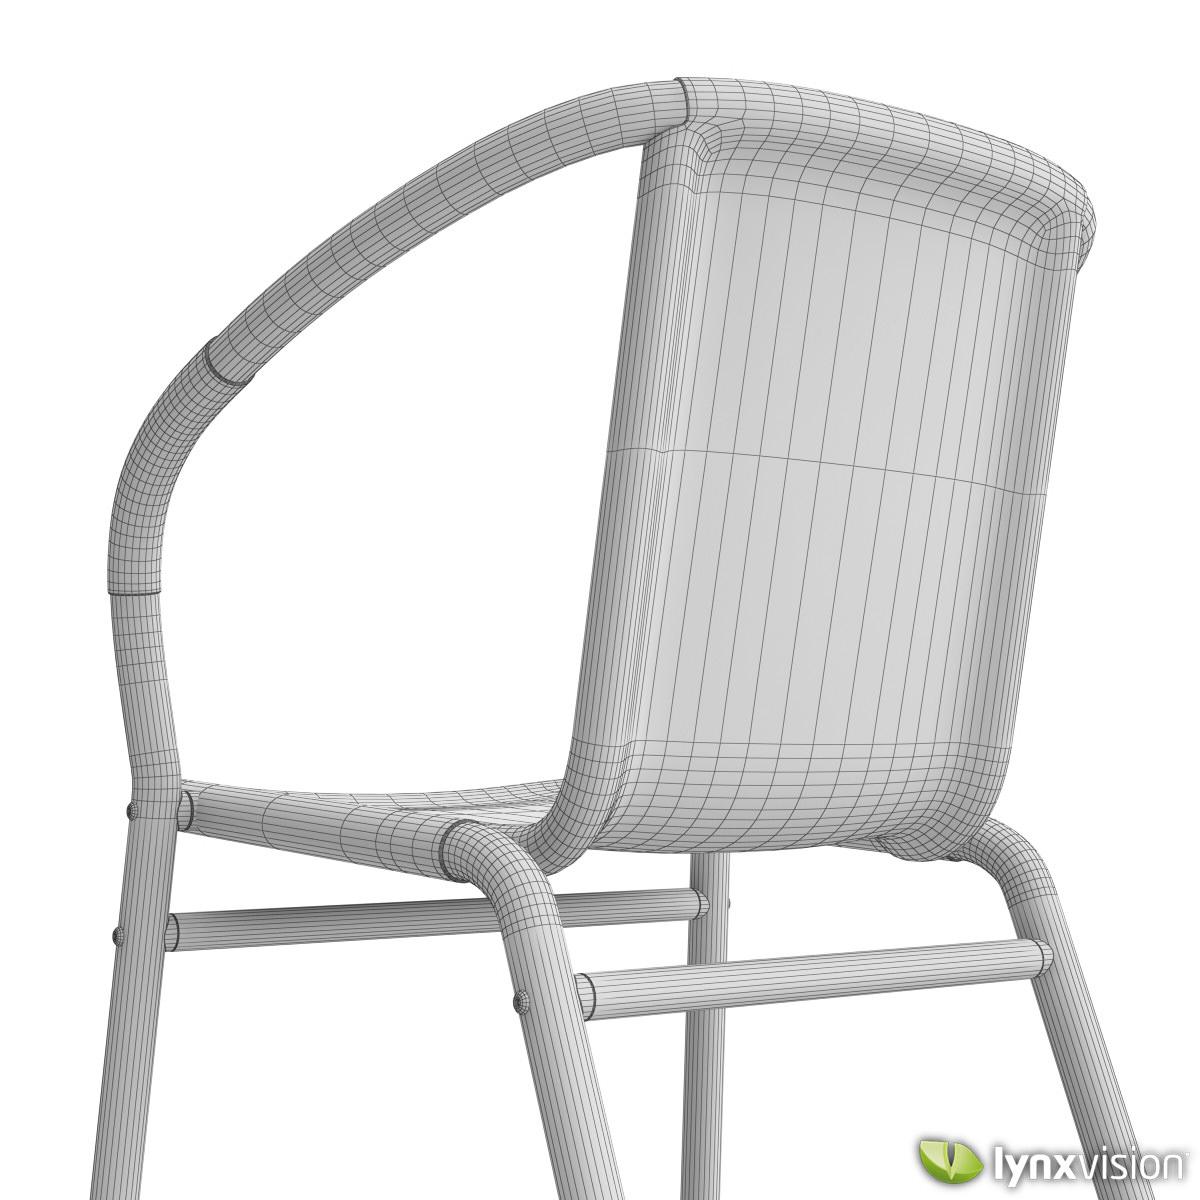 ... Outdoor Aluminum Chairs Collection 3d Model Max Obj Fbx C4d Lwo Lw Lws  Lxo Lxl 8 Part 52